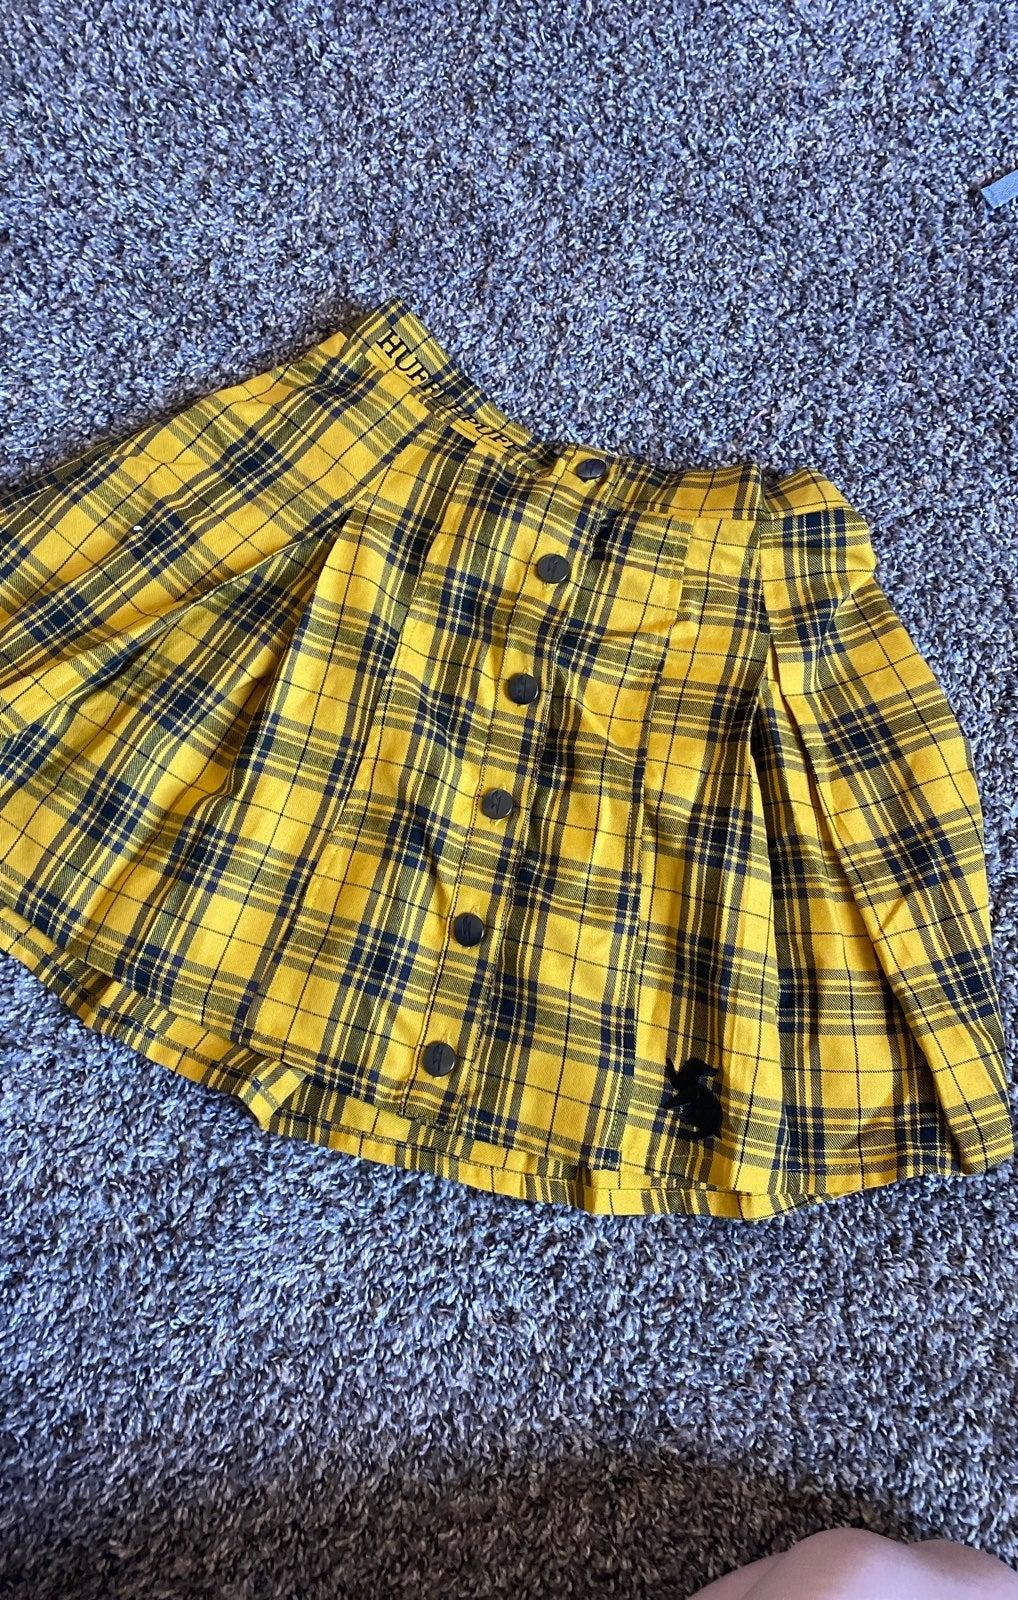 Hufflepuff skirt